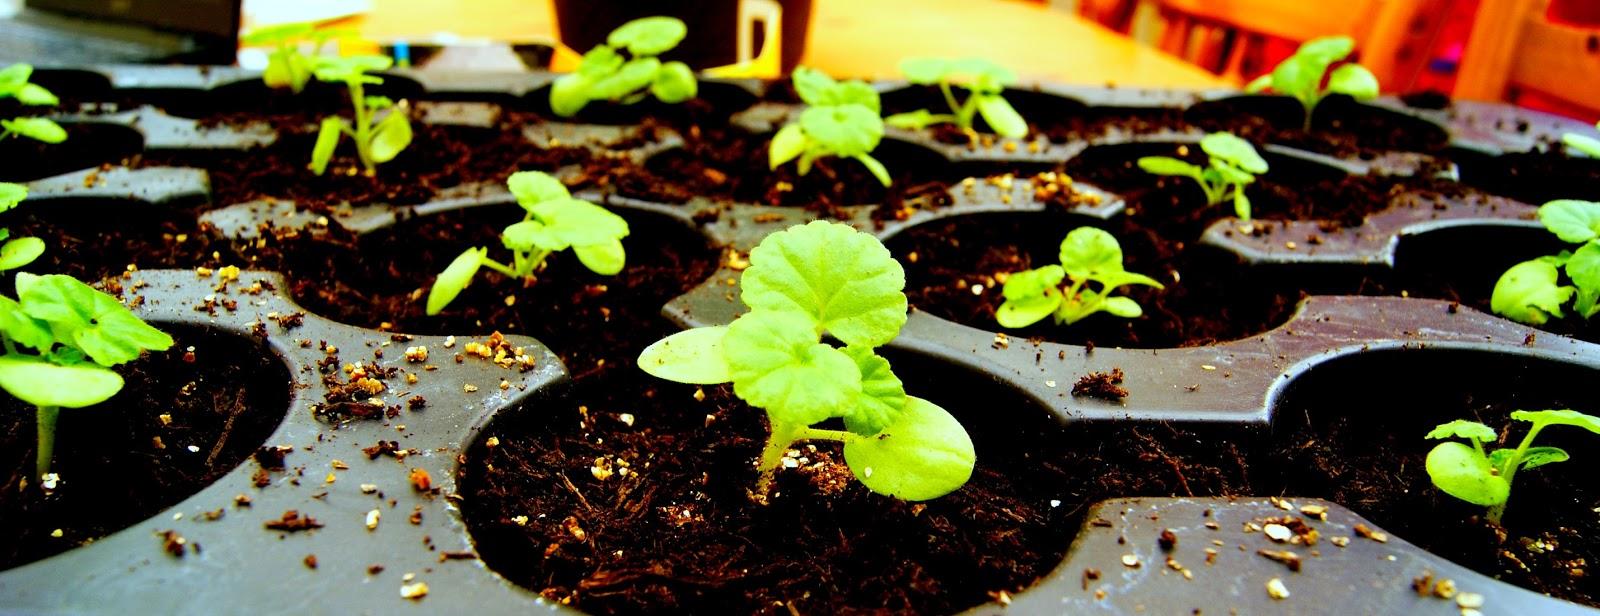 the syders thrifty garden geranium plug plants. Black Bedroom Furniture Sets. Home Design Ideas